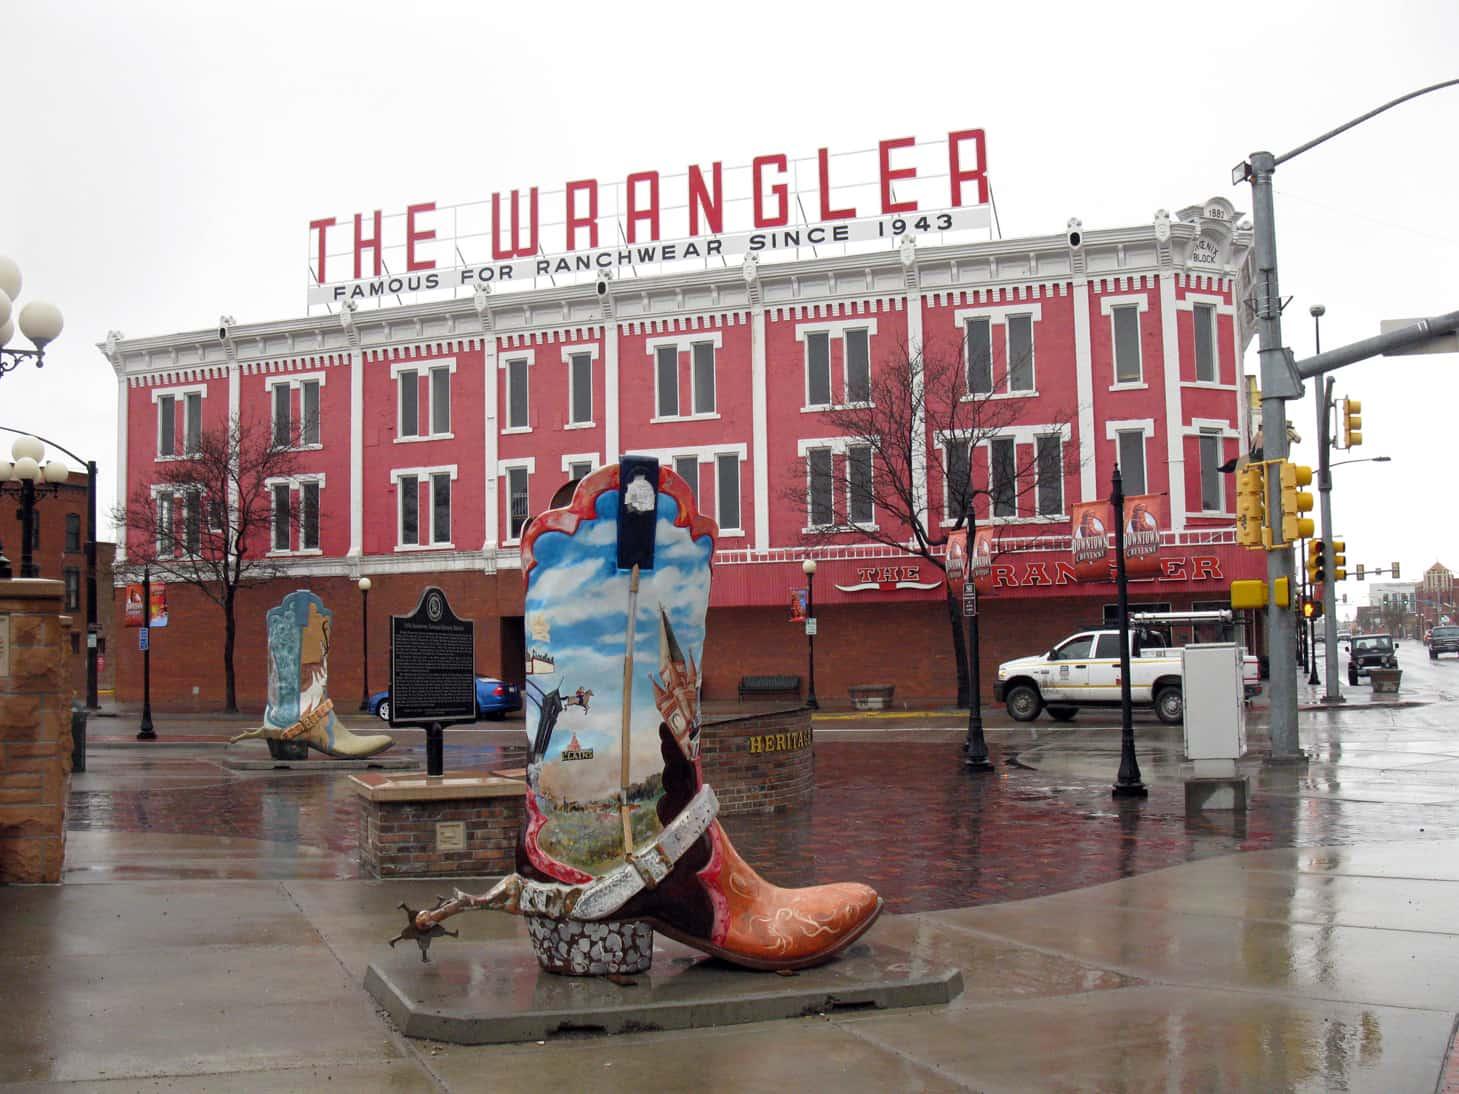 chey-wrangler